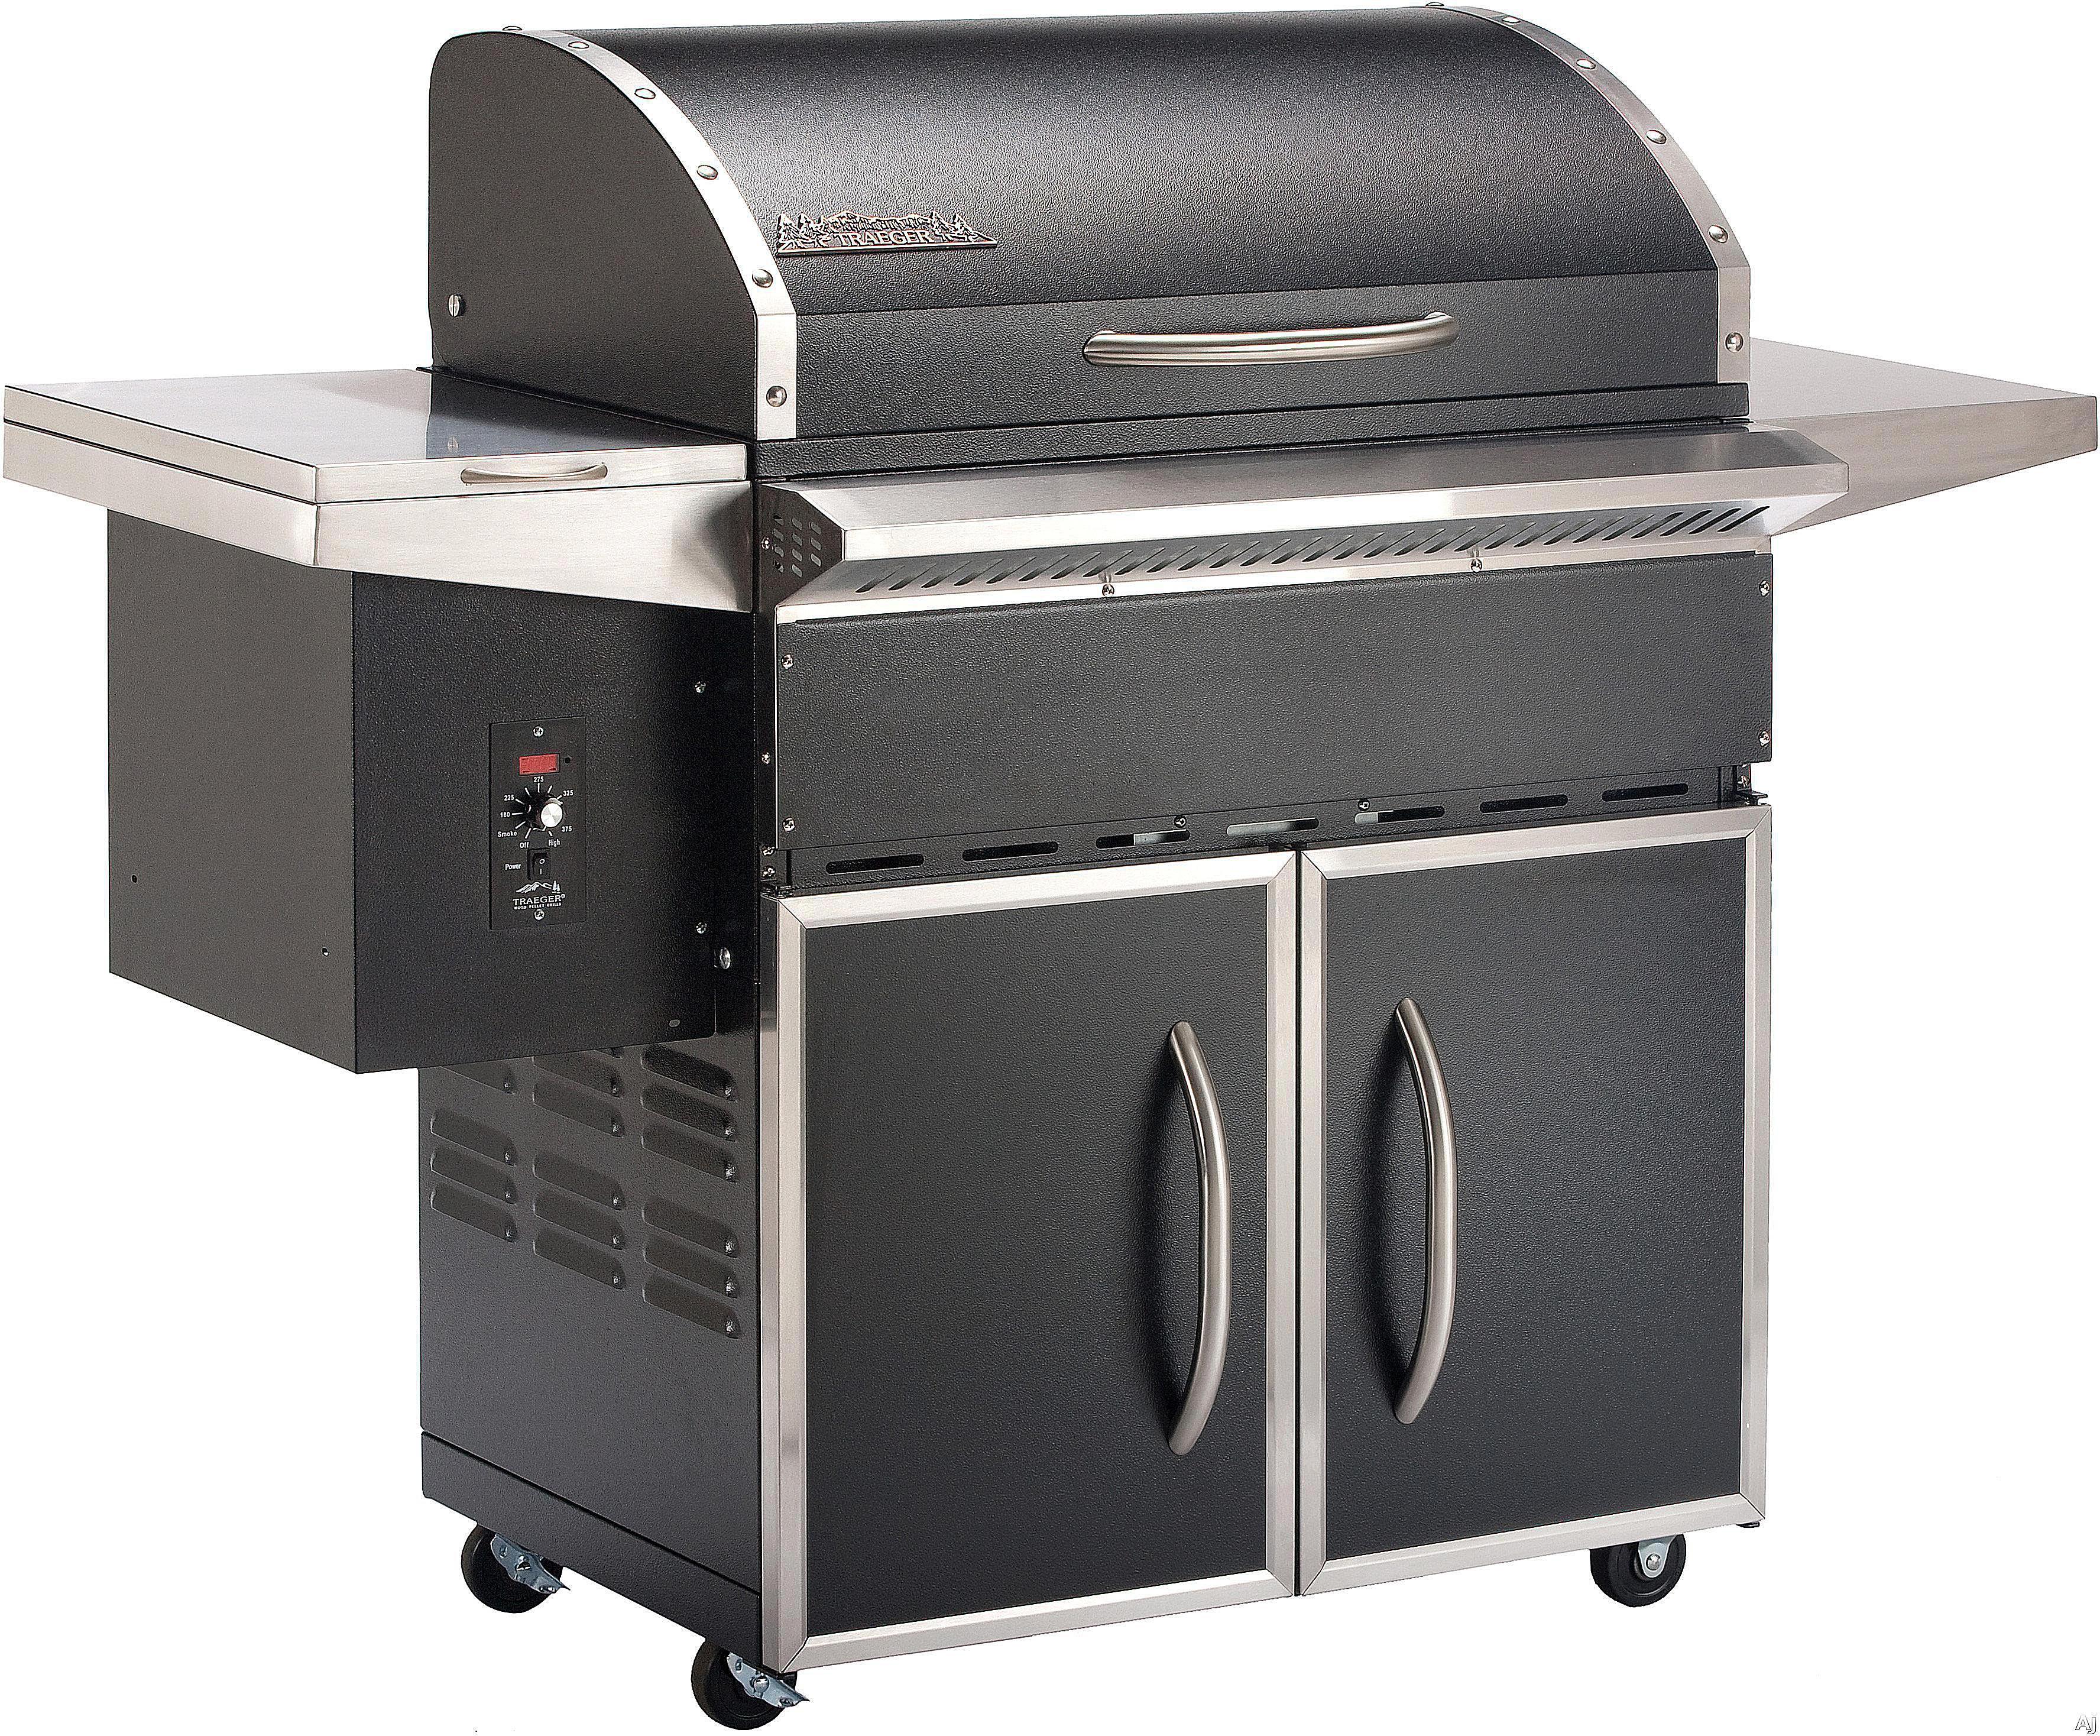 traeger select pellet grill model bbq400 review. Black Bedroom Furniture Sets. Home Design Ideas